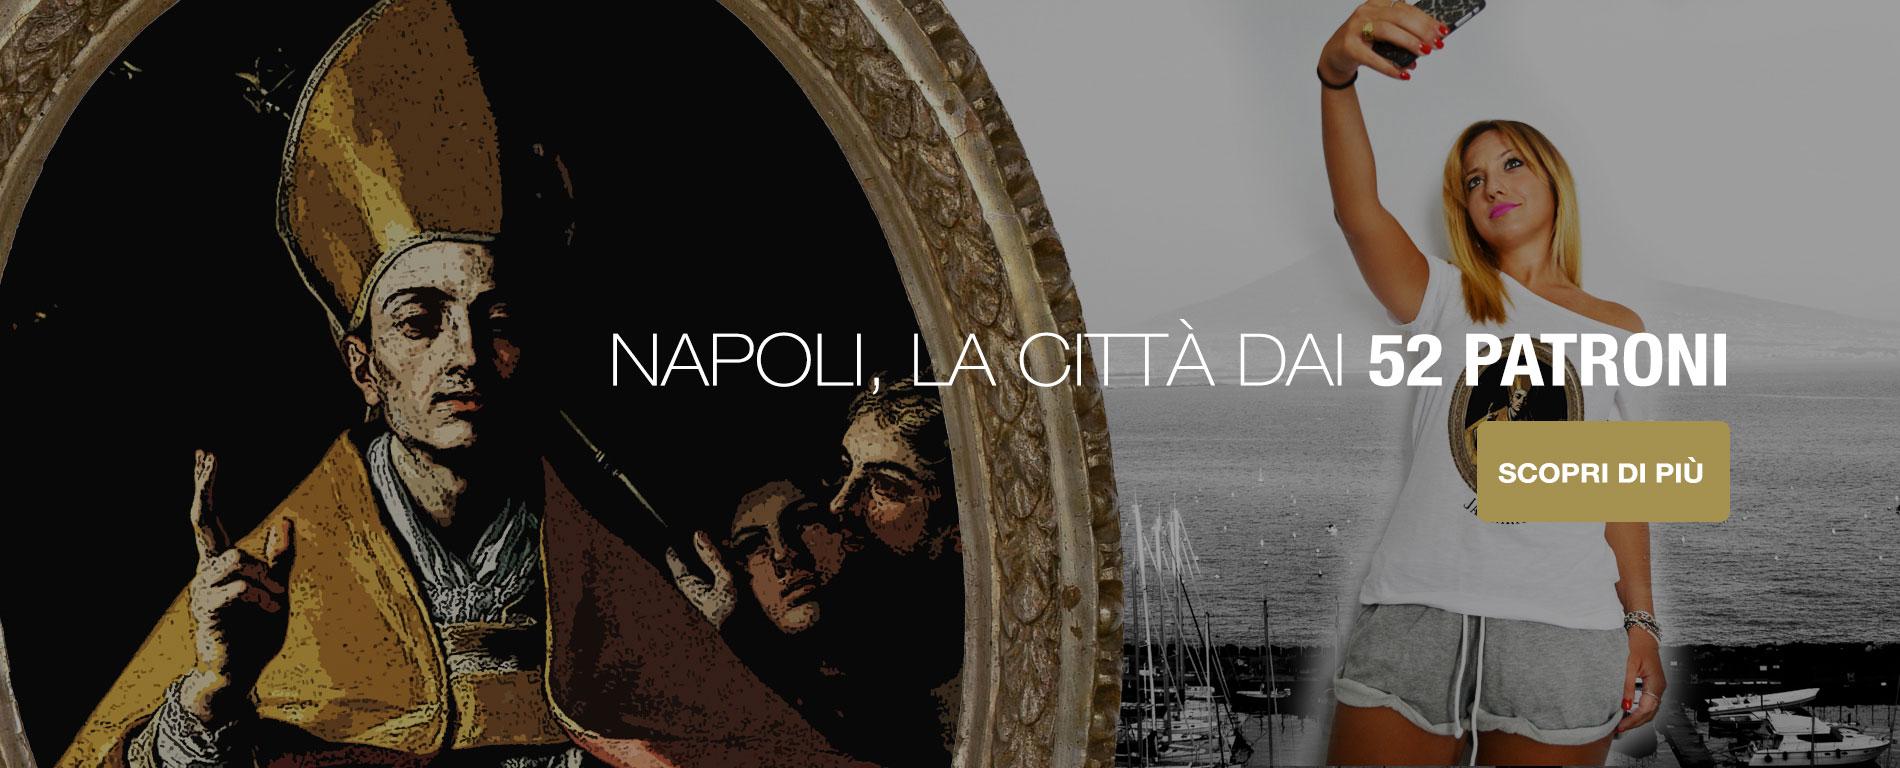 Scopri le T-Shirt dedicate ai Santi Patroni di Napoli